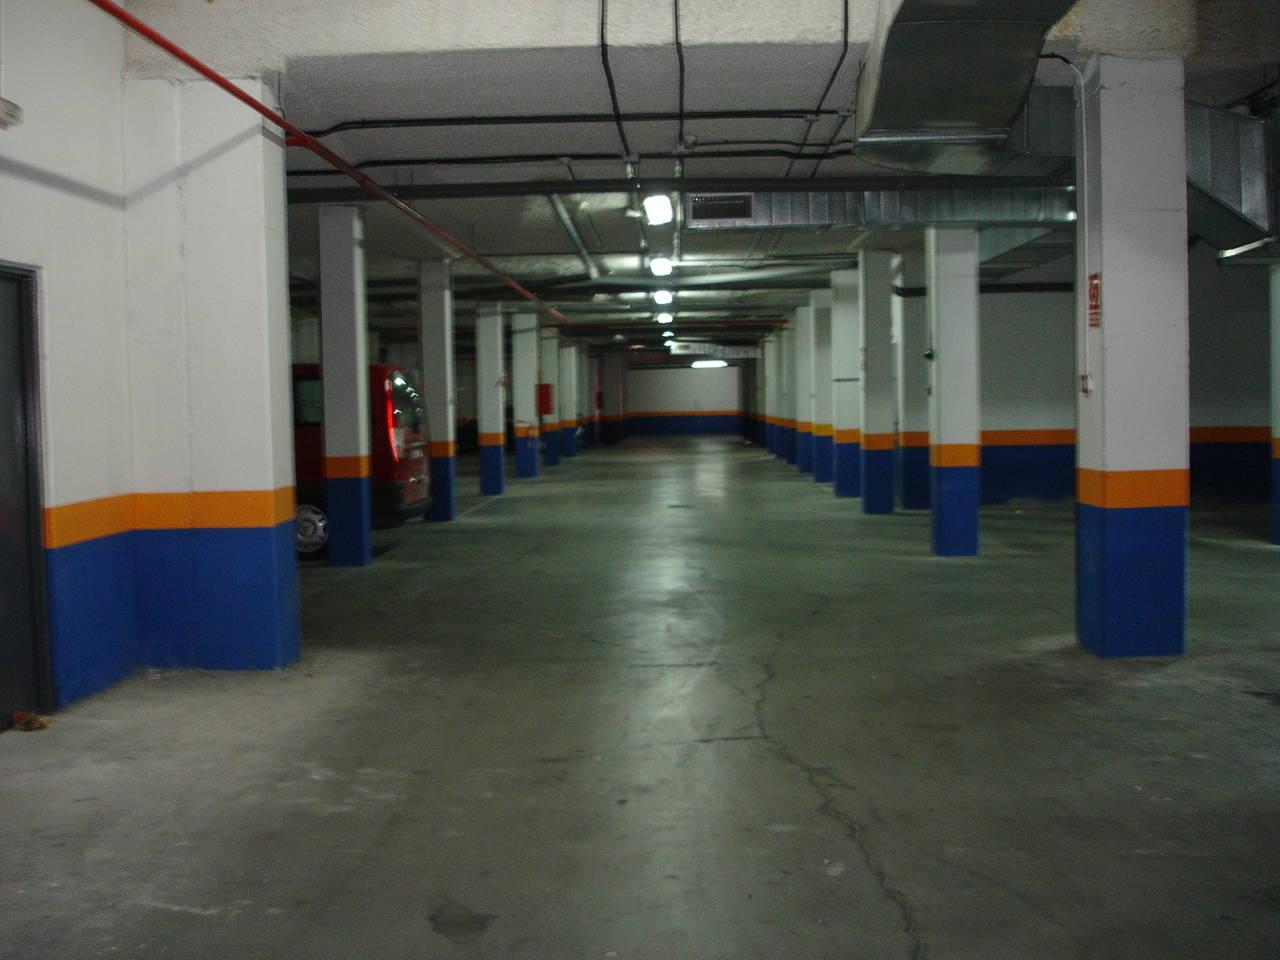 Sanchinarro, de 1 a 5 plazas de garaje. Alquilo-vendo.